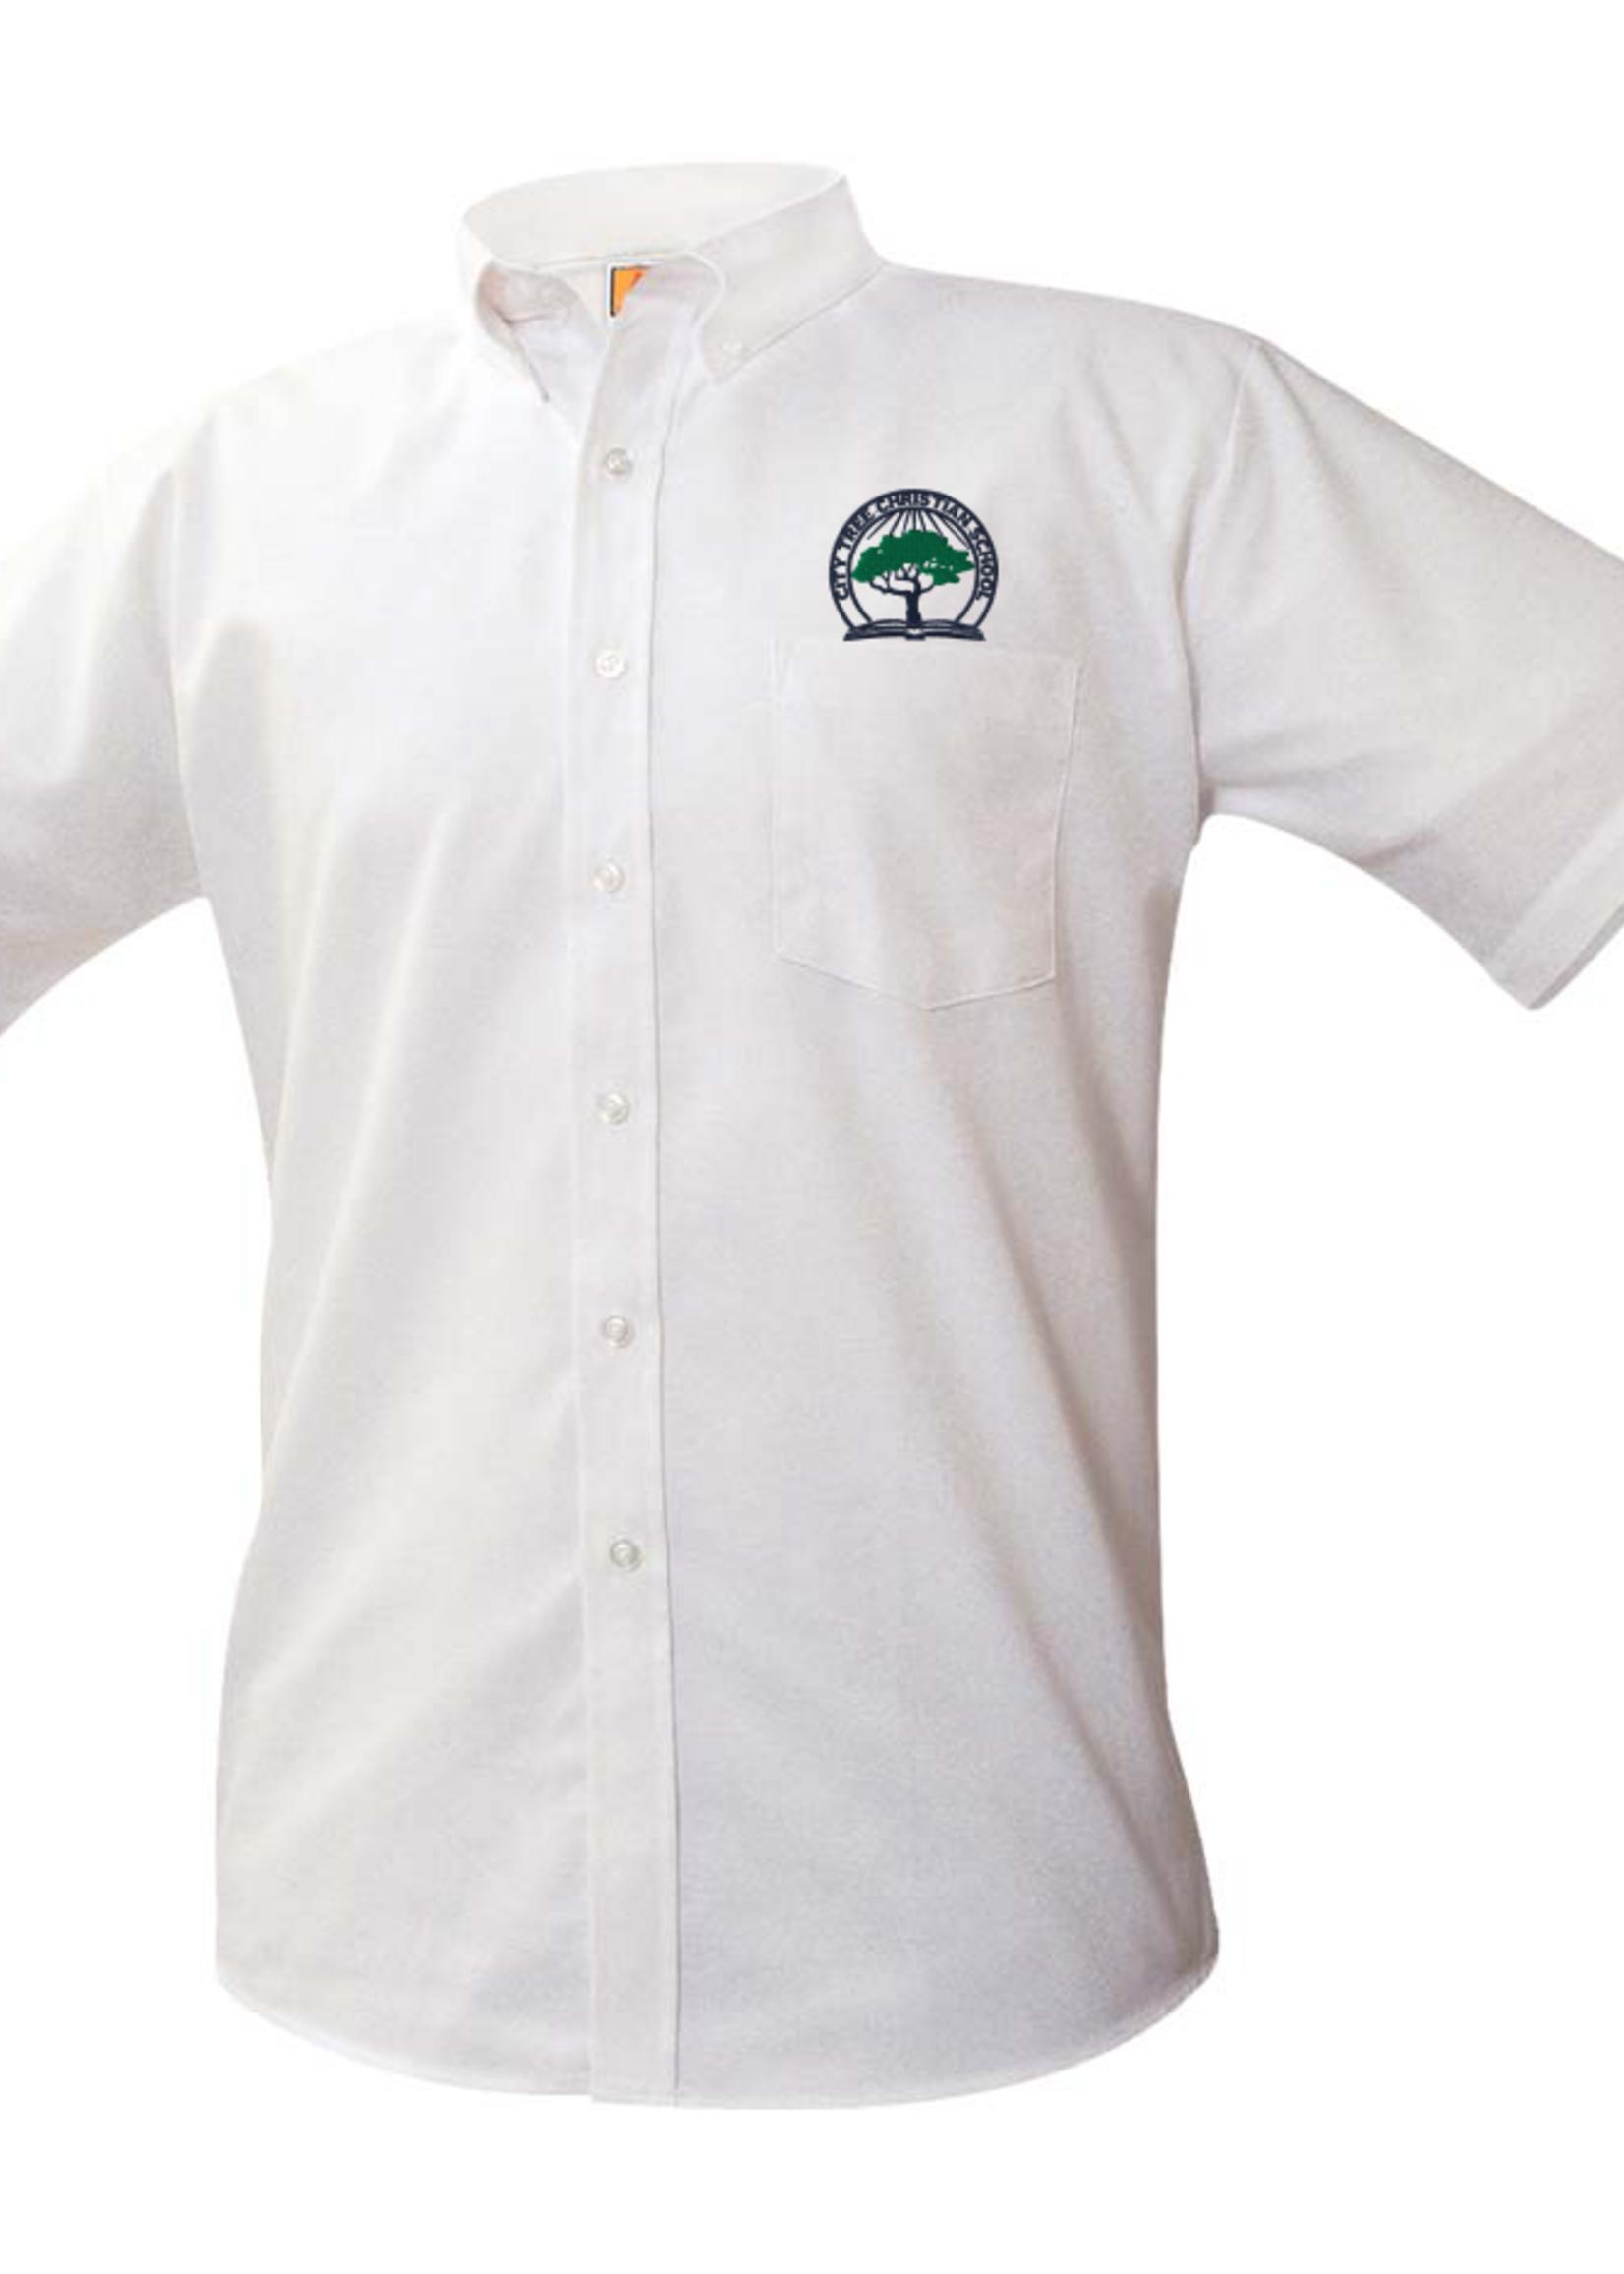 TUS CTCS White Short Sleeve Oxford Shirt